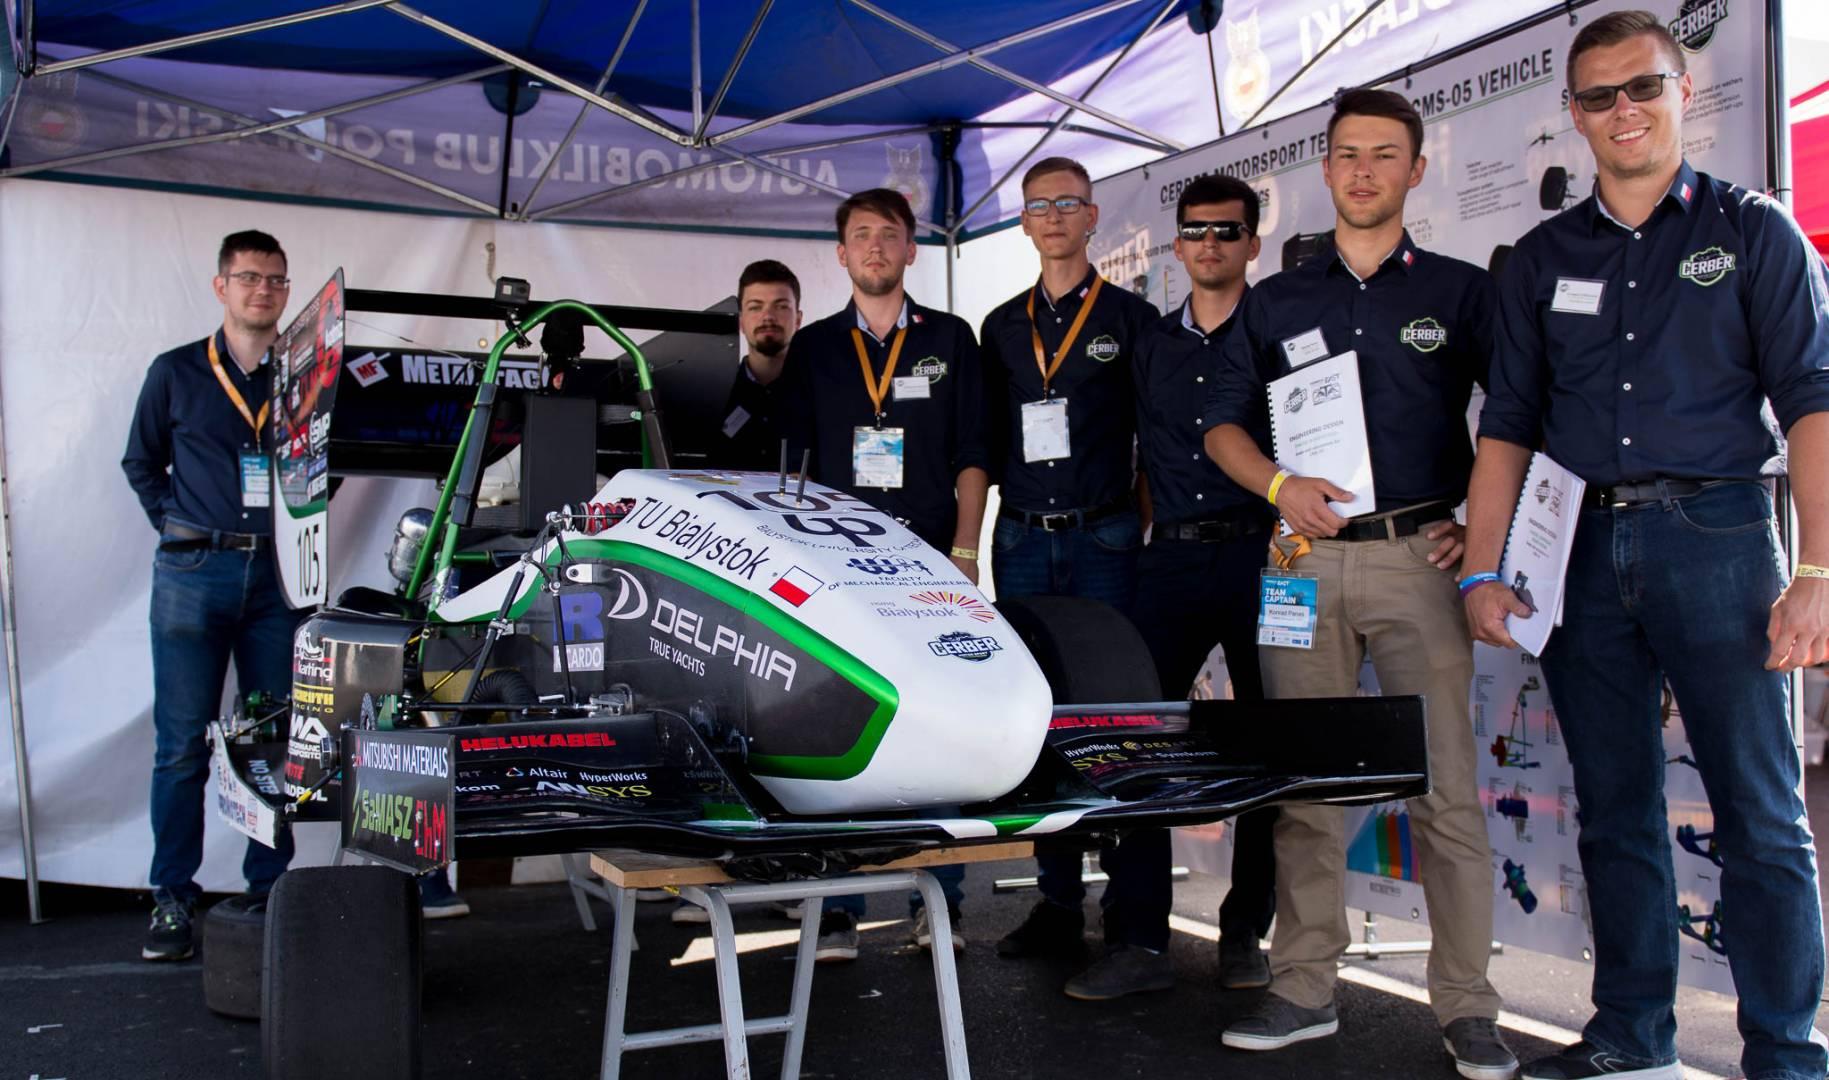 ANSYS_Academic_Program-Cerber_Motorsport zespol (4)